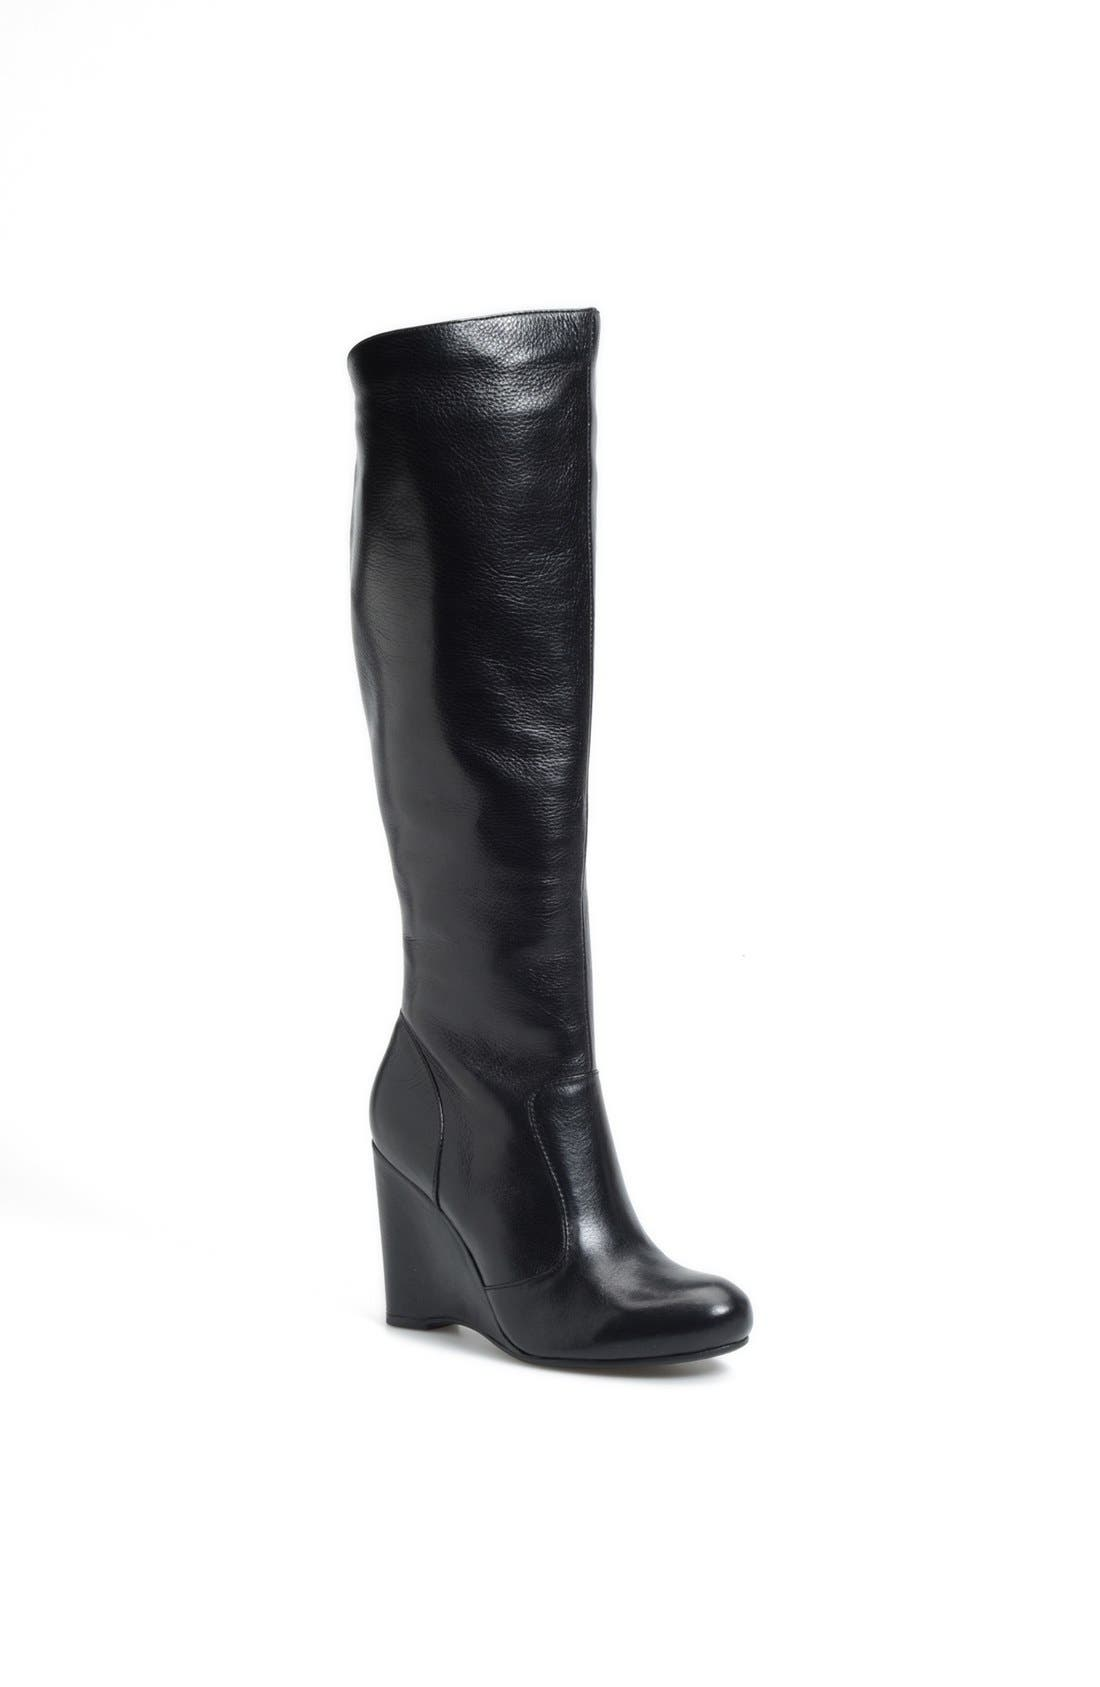 Alternate Image 1 Selected - Børn 'Olana' Boot